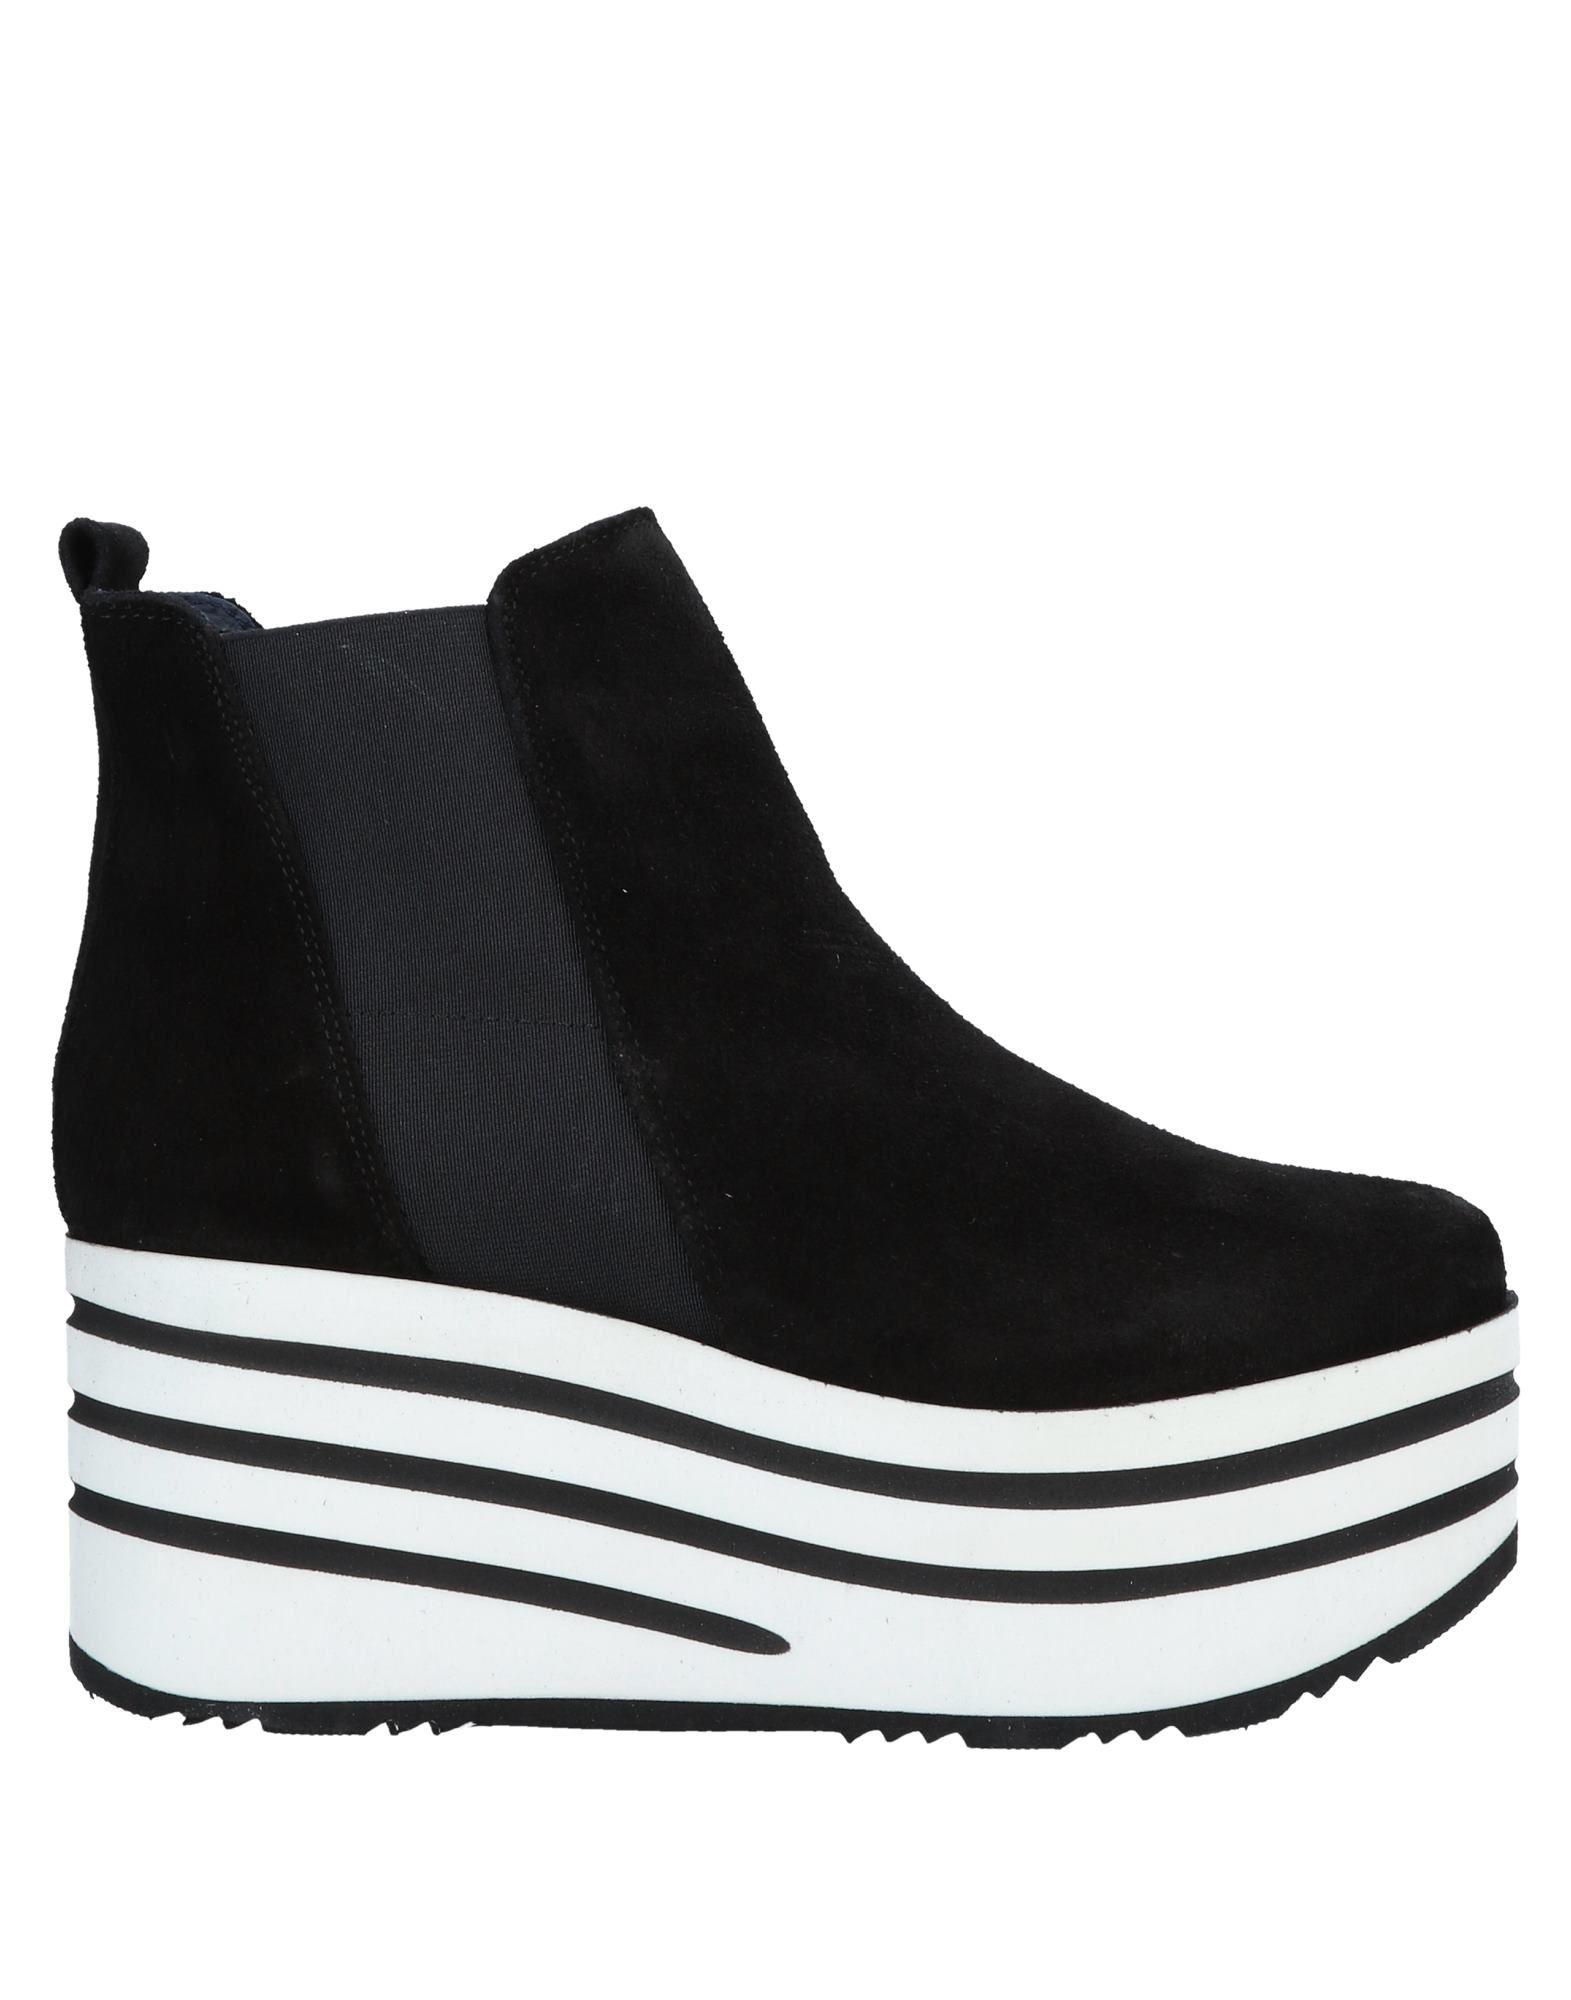 CLAUDIA BY ISABERI Полусапоги и высокие ботинки studio by volpato ботинки